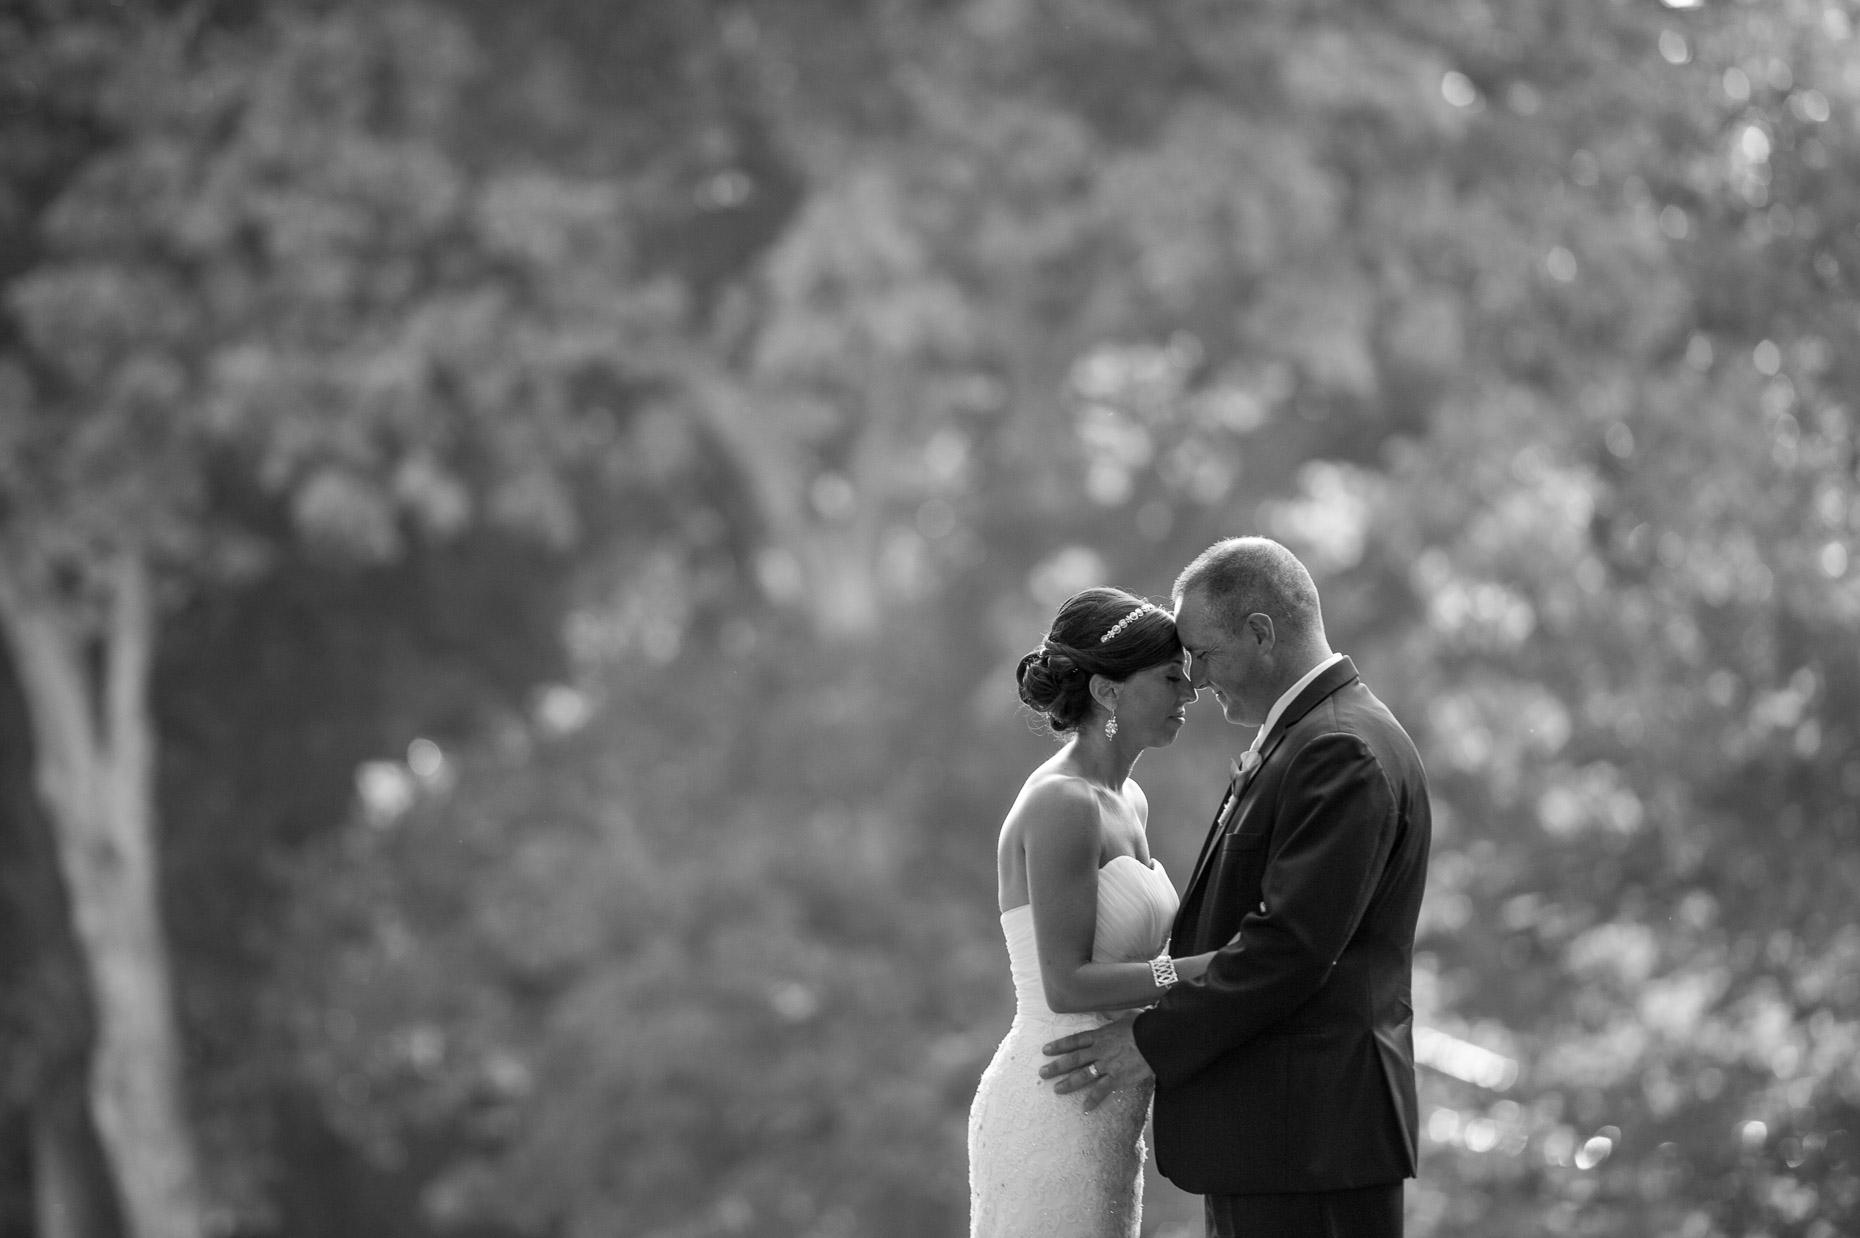 Weddings by Elliott O'Donovan - Washington DC_-4.jpg